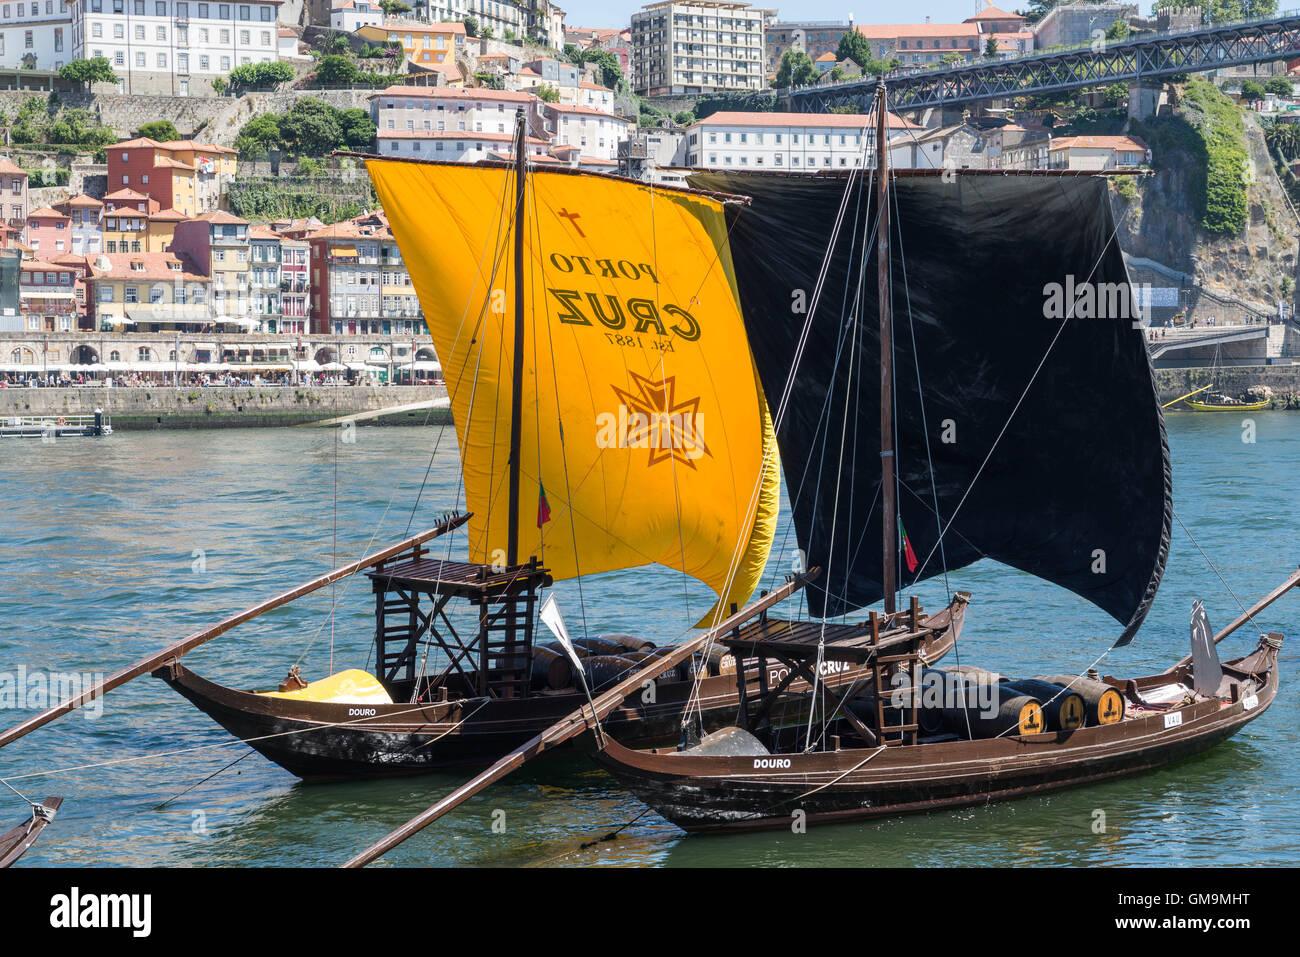 Barcos rabelos, traditional wooden boats, on the river Douro, Vila Nova de Gaia Stock Photo